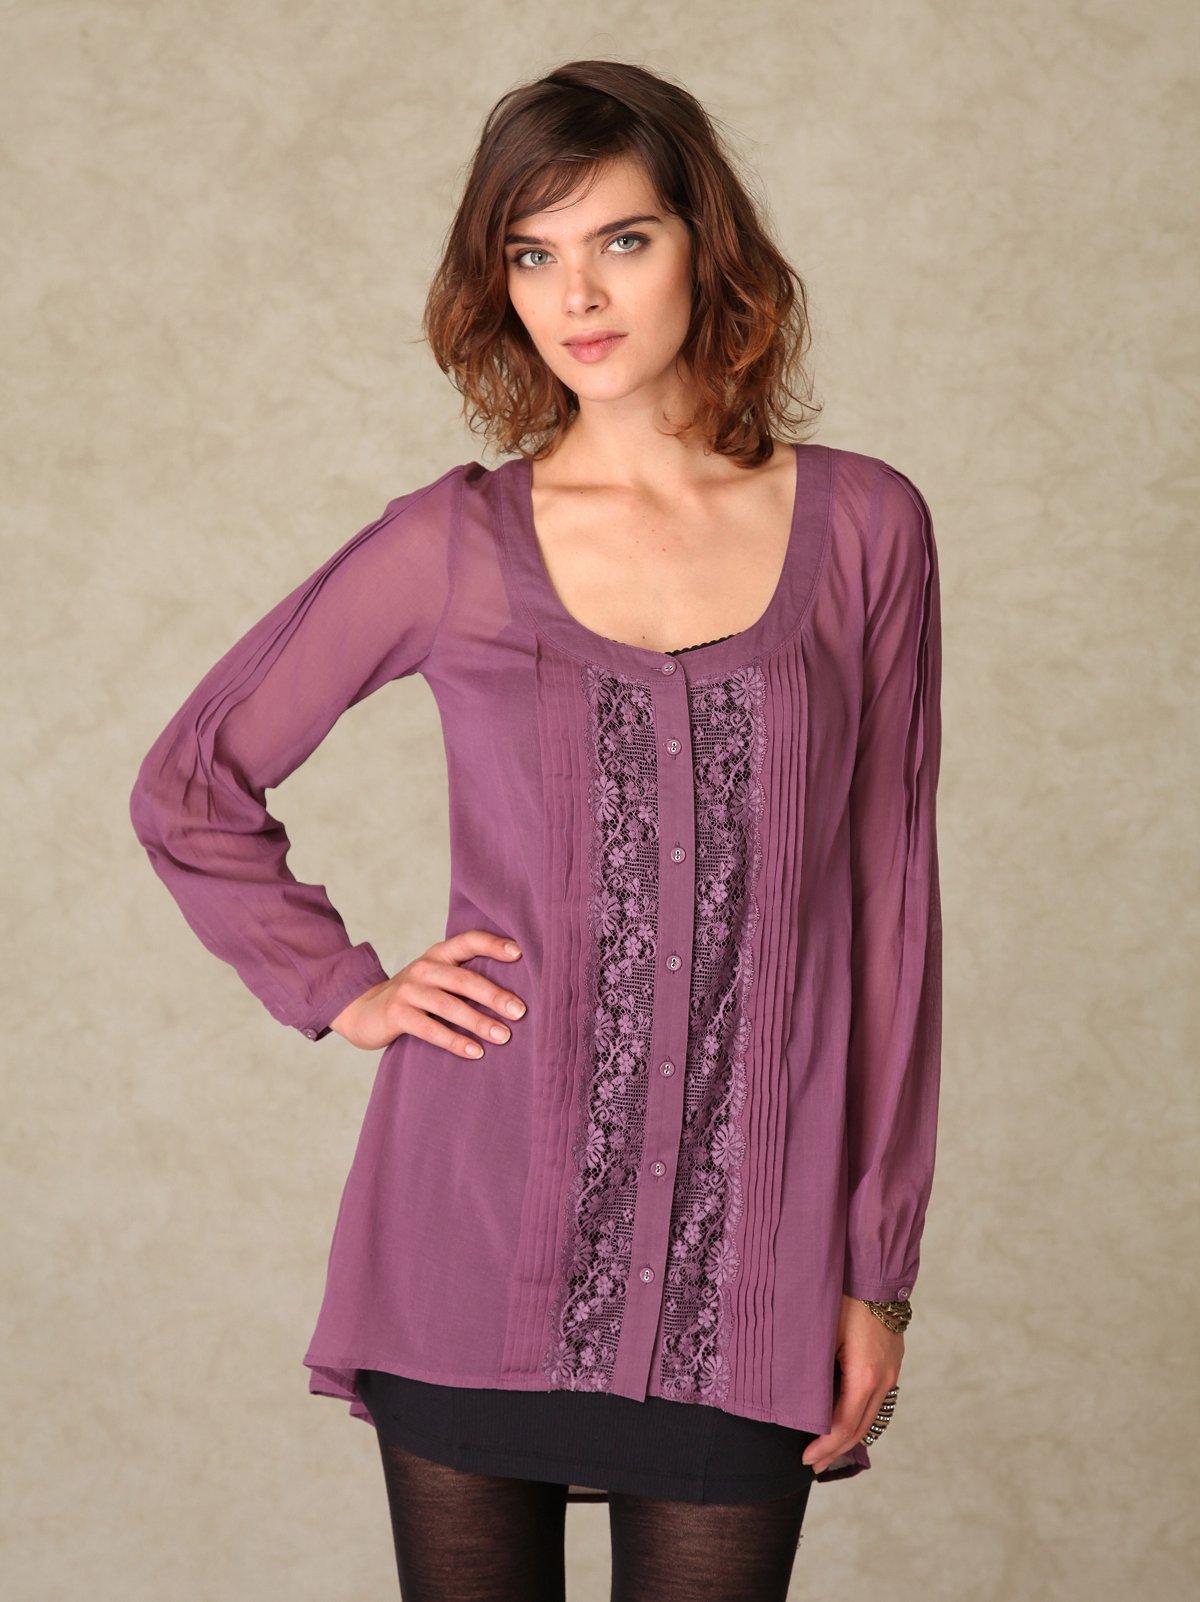 Centered Lace Buttondown